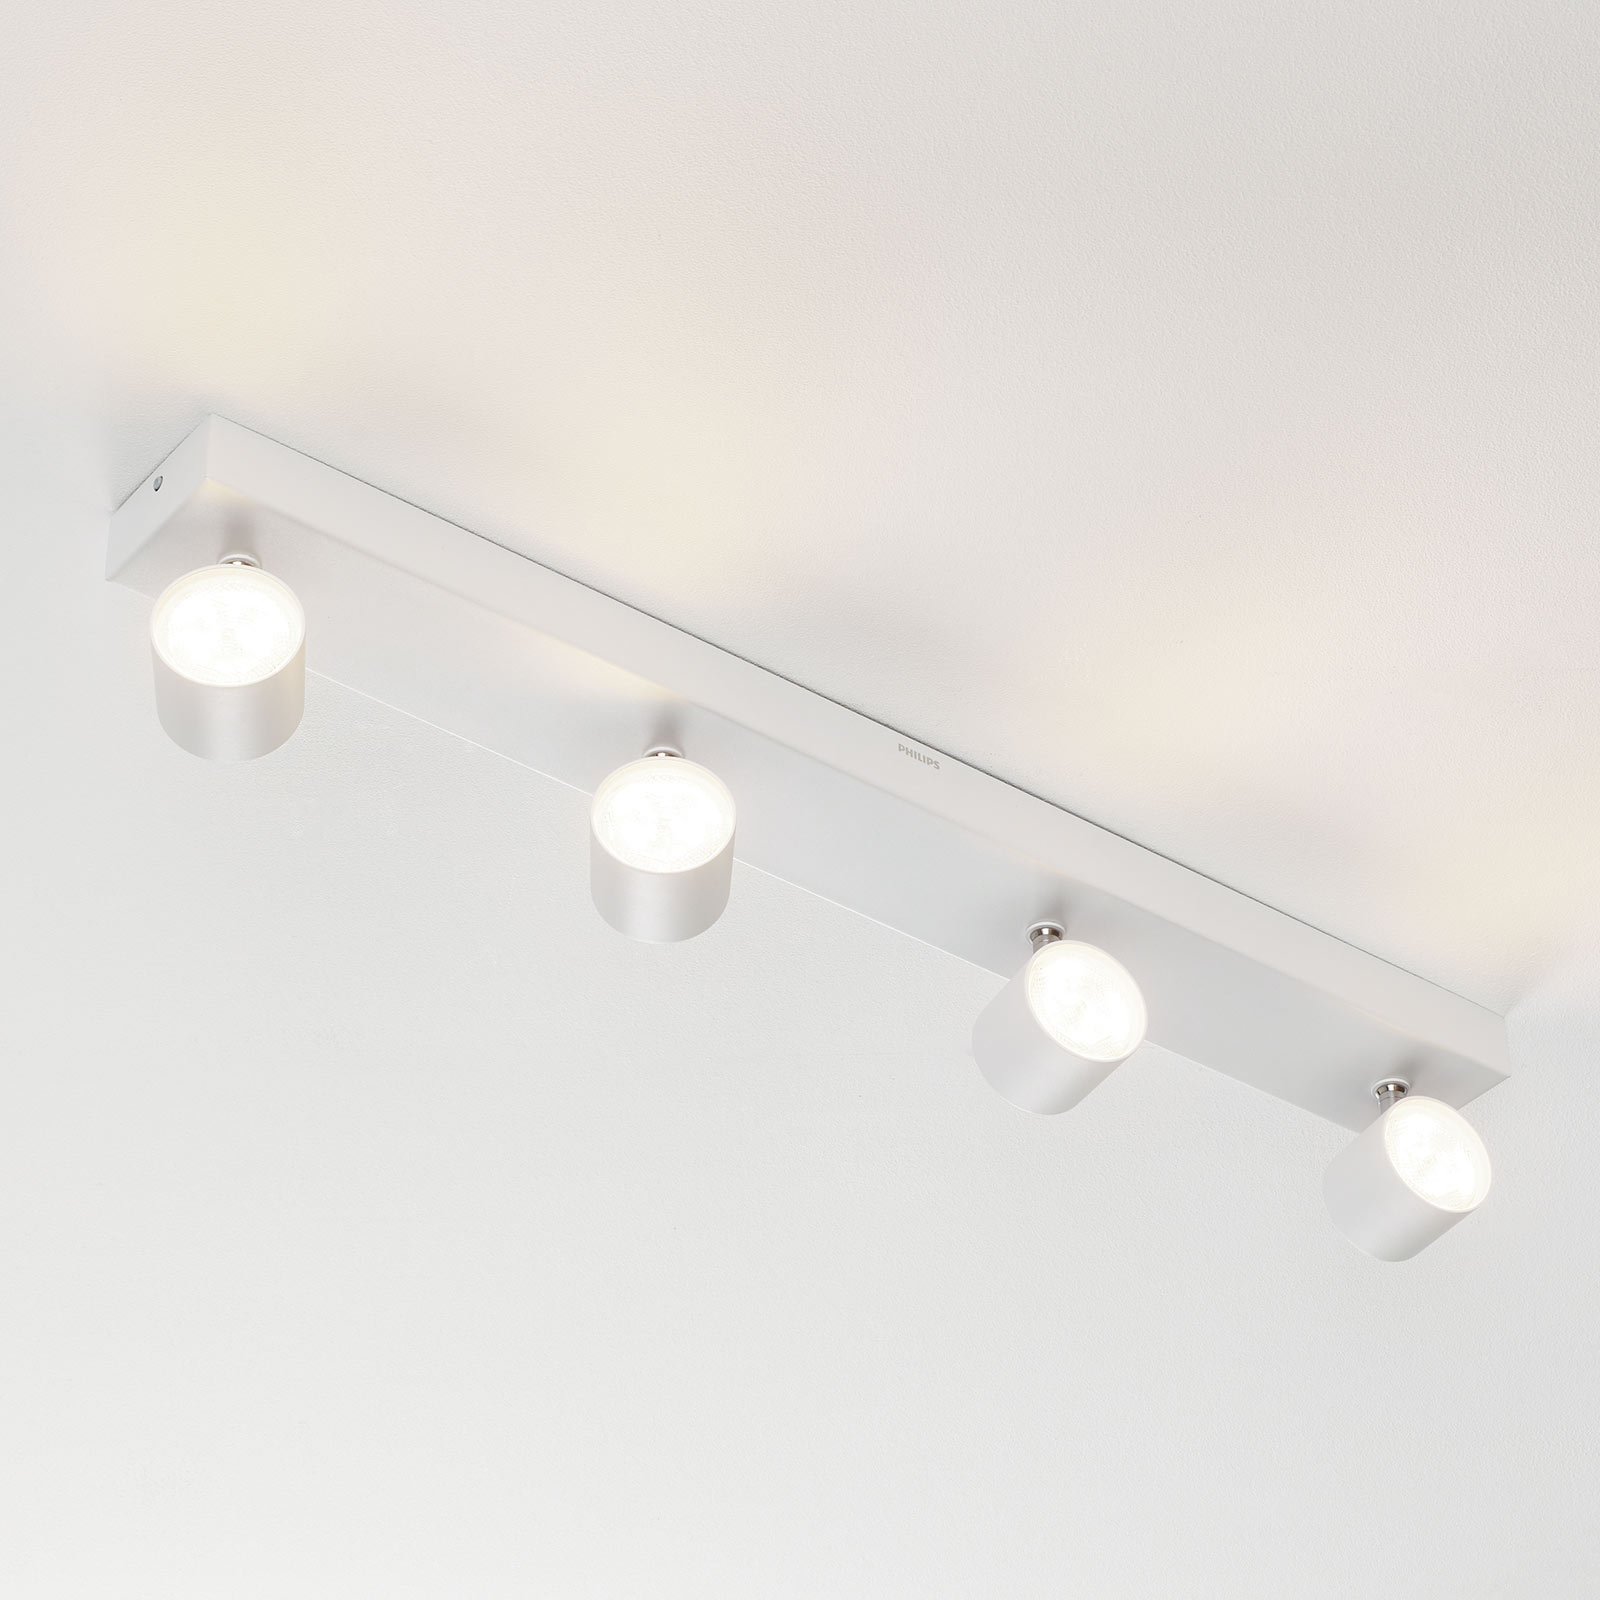 Plafonnier LED avec 4 spots Star blanc, warmglow